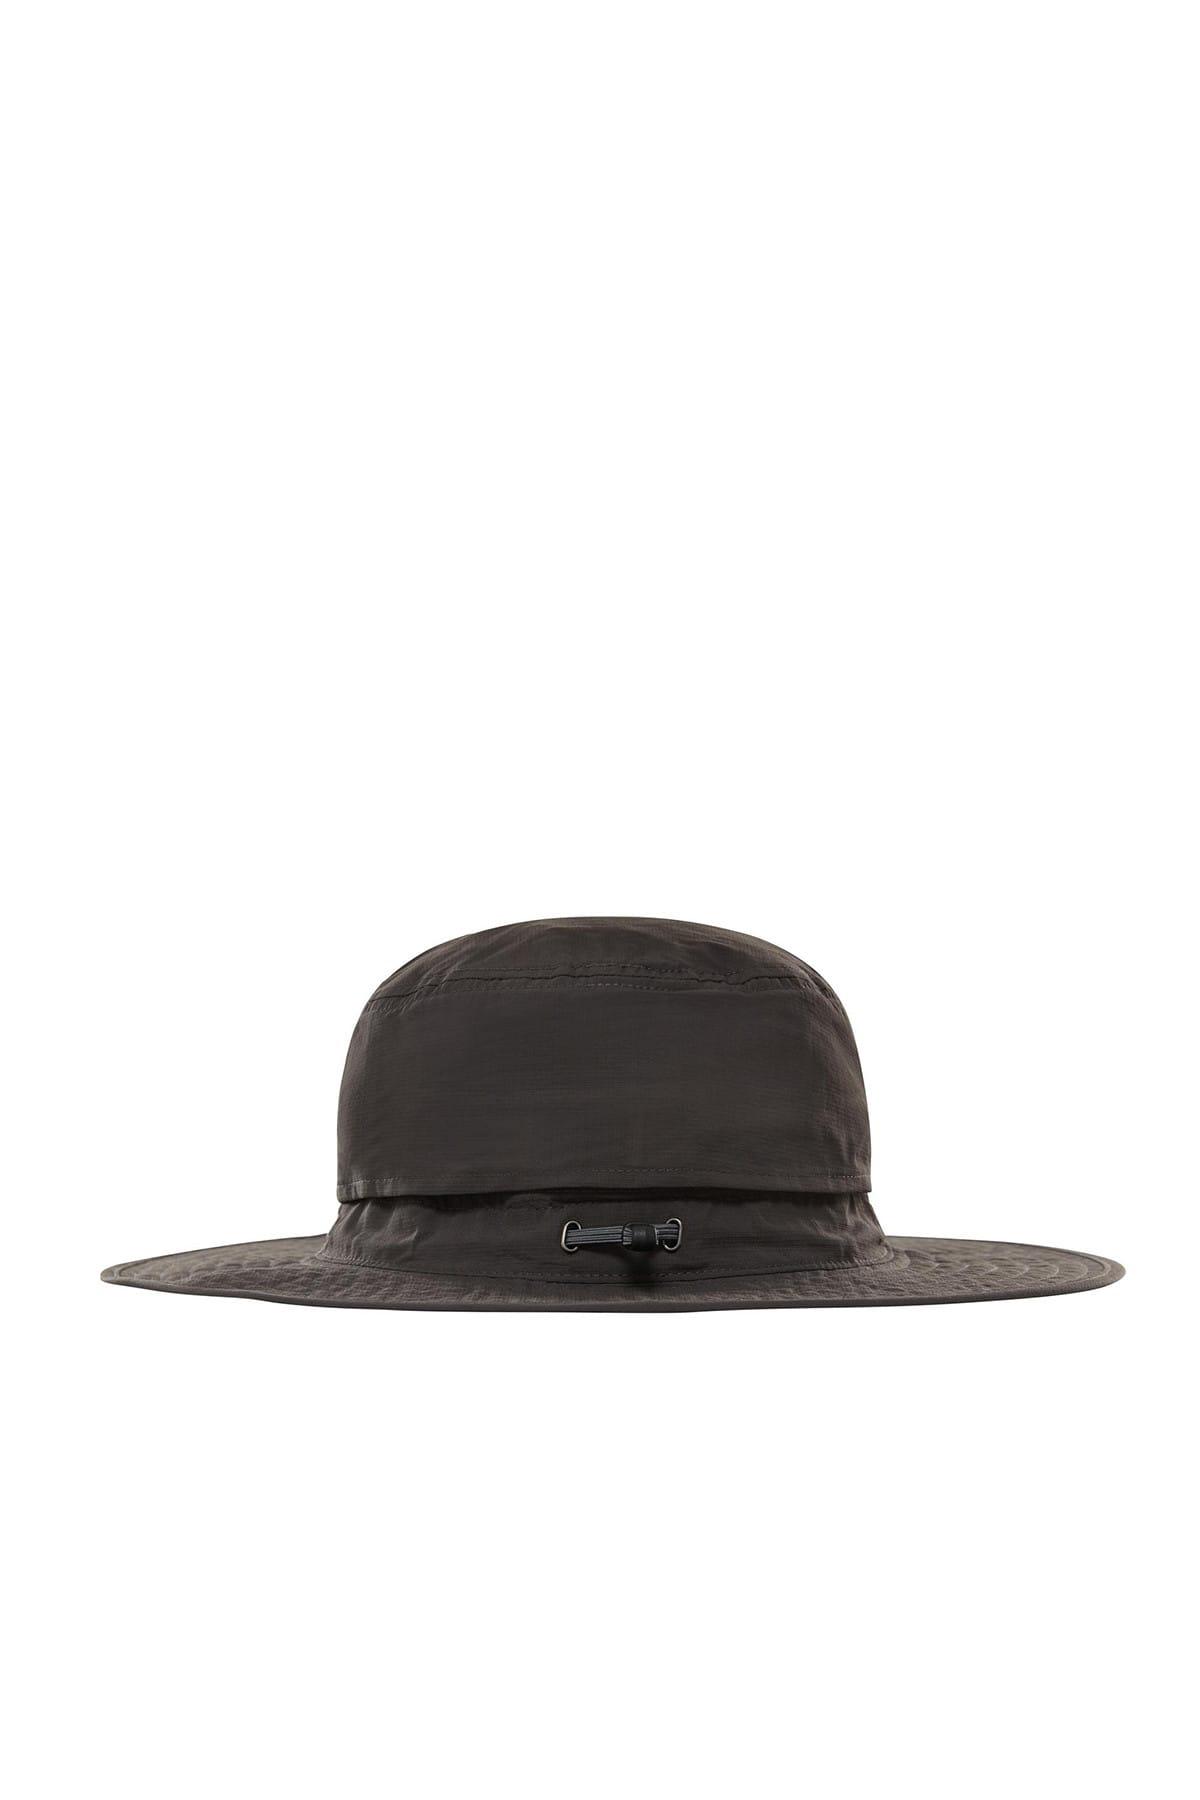 THE NORTH FACE Horizon Breeze Brimmer Şapka Gri/Siyah 1